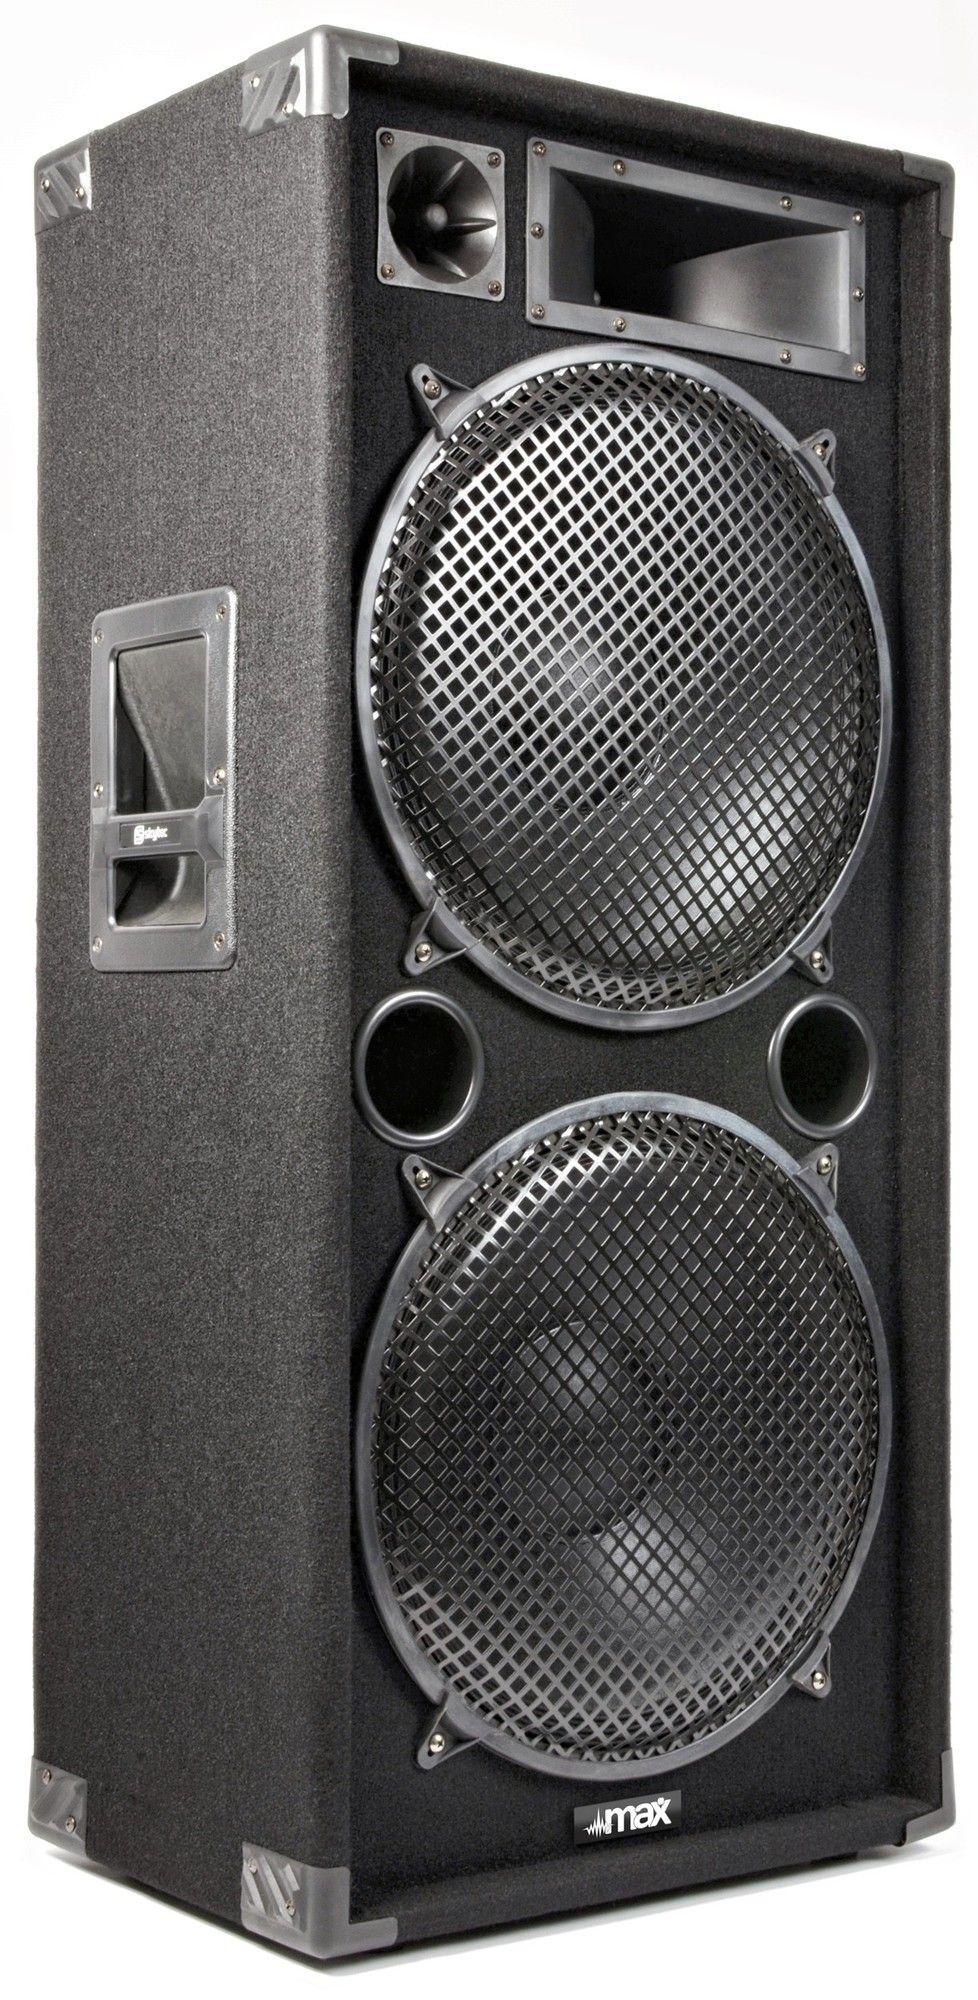 "Afbeelding van 2e keus - MAX Disco Speaker MAX215 2000W 2x 15""..."